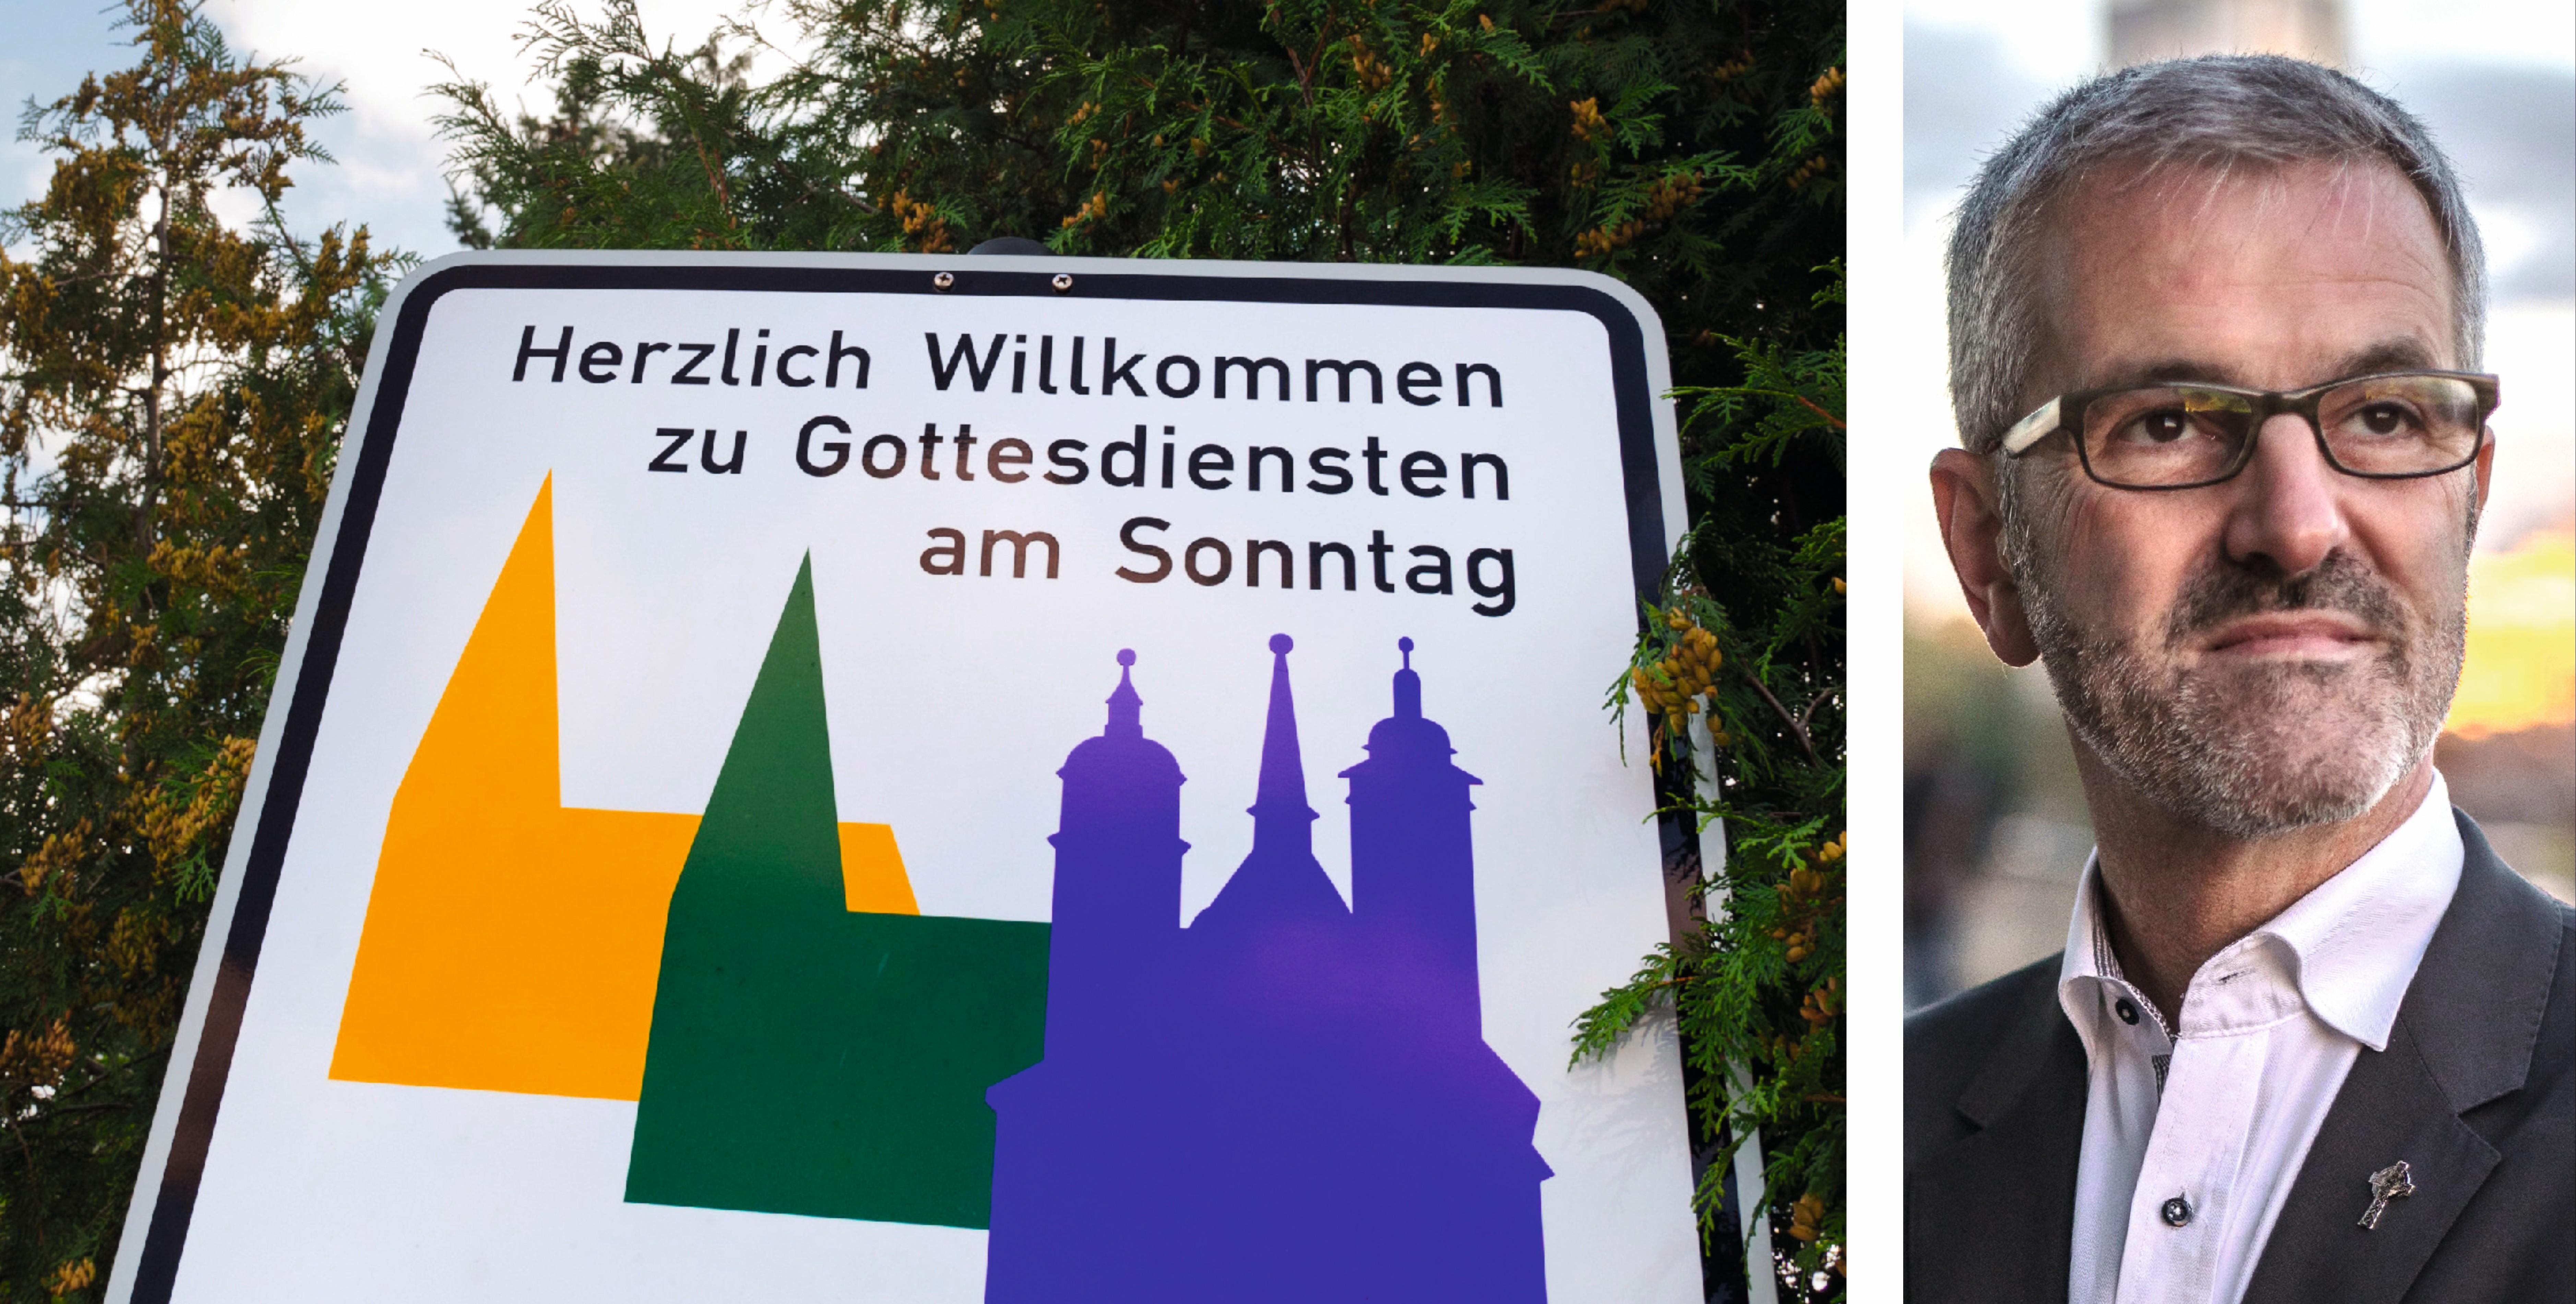 Sind Volkskirchen wünschenswert? Nein, meint der Priester Thomas Frings. (Fotos: epd/Neetz;Schoon)